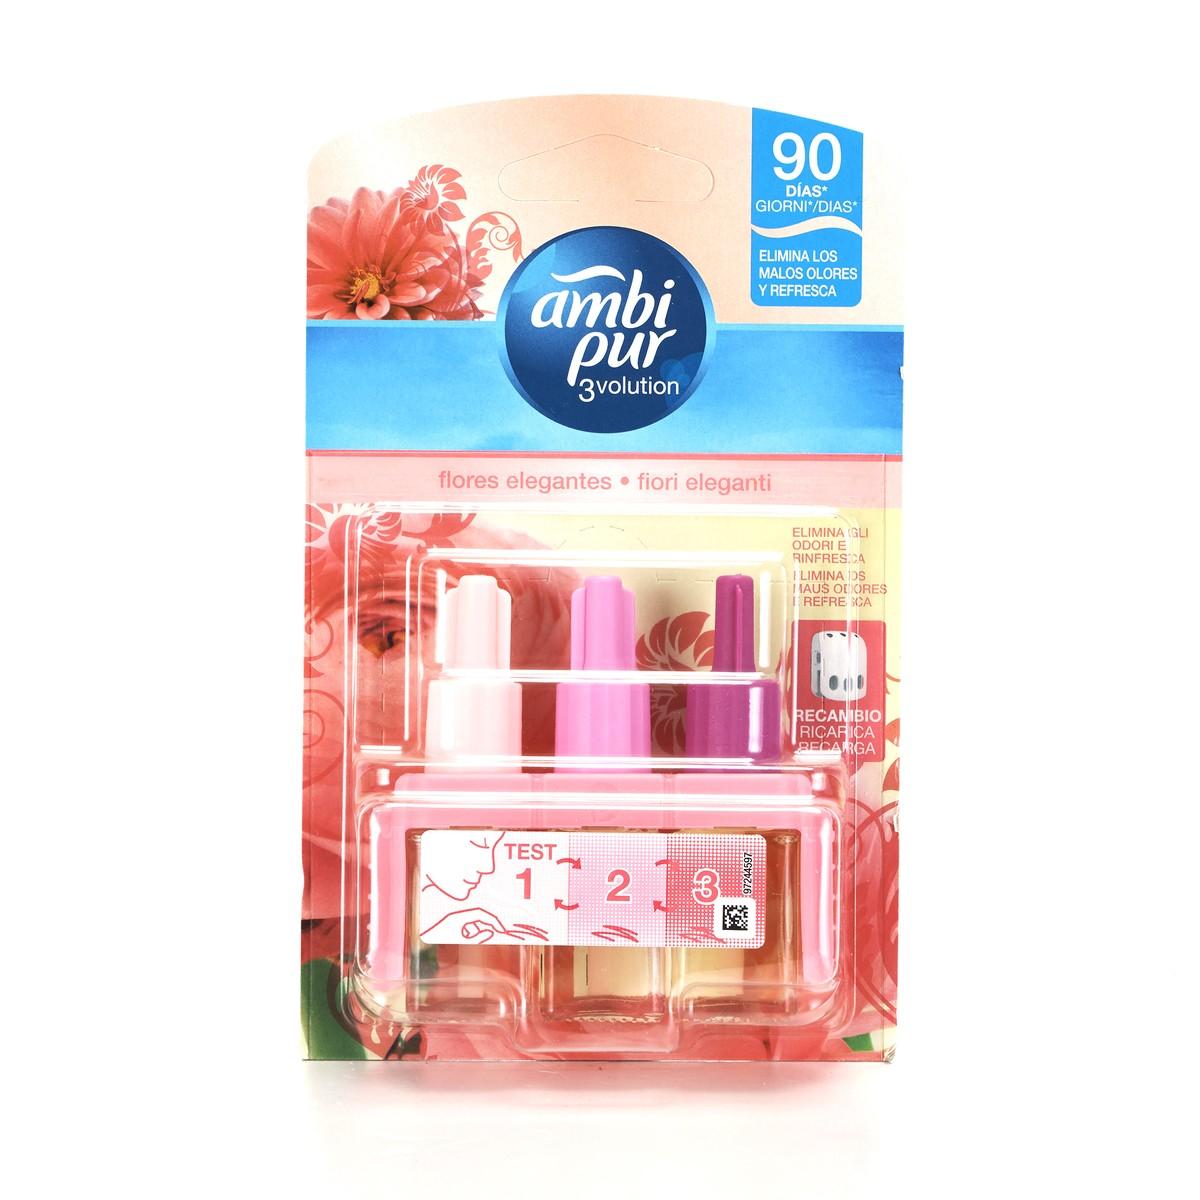 Deodoranti Per Ambienti.Ambi Pur Ricarica Deodorante Per Ambienti Lowprice Ch